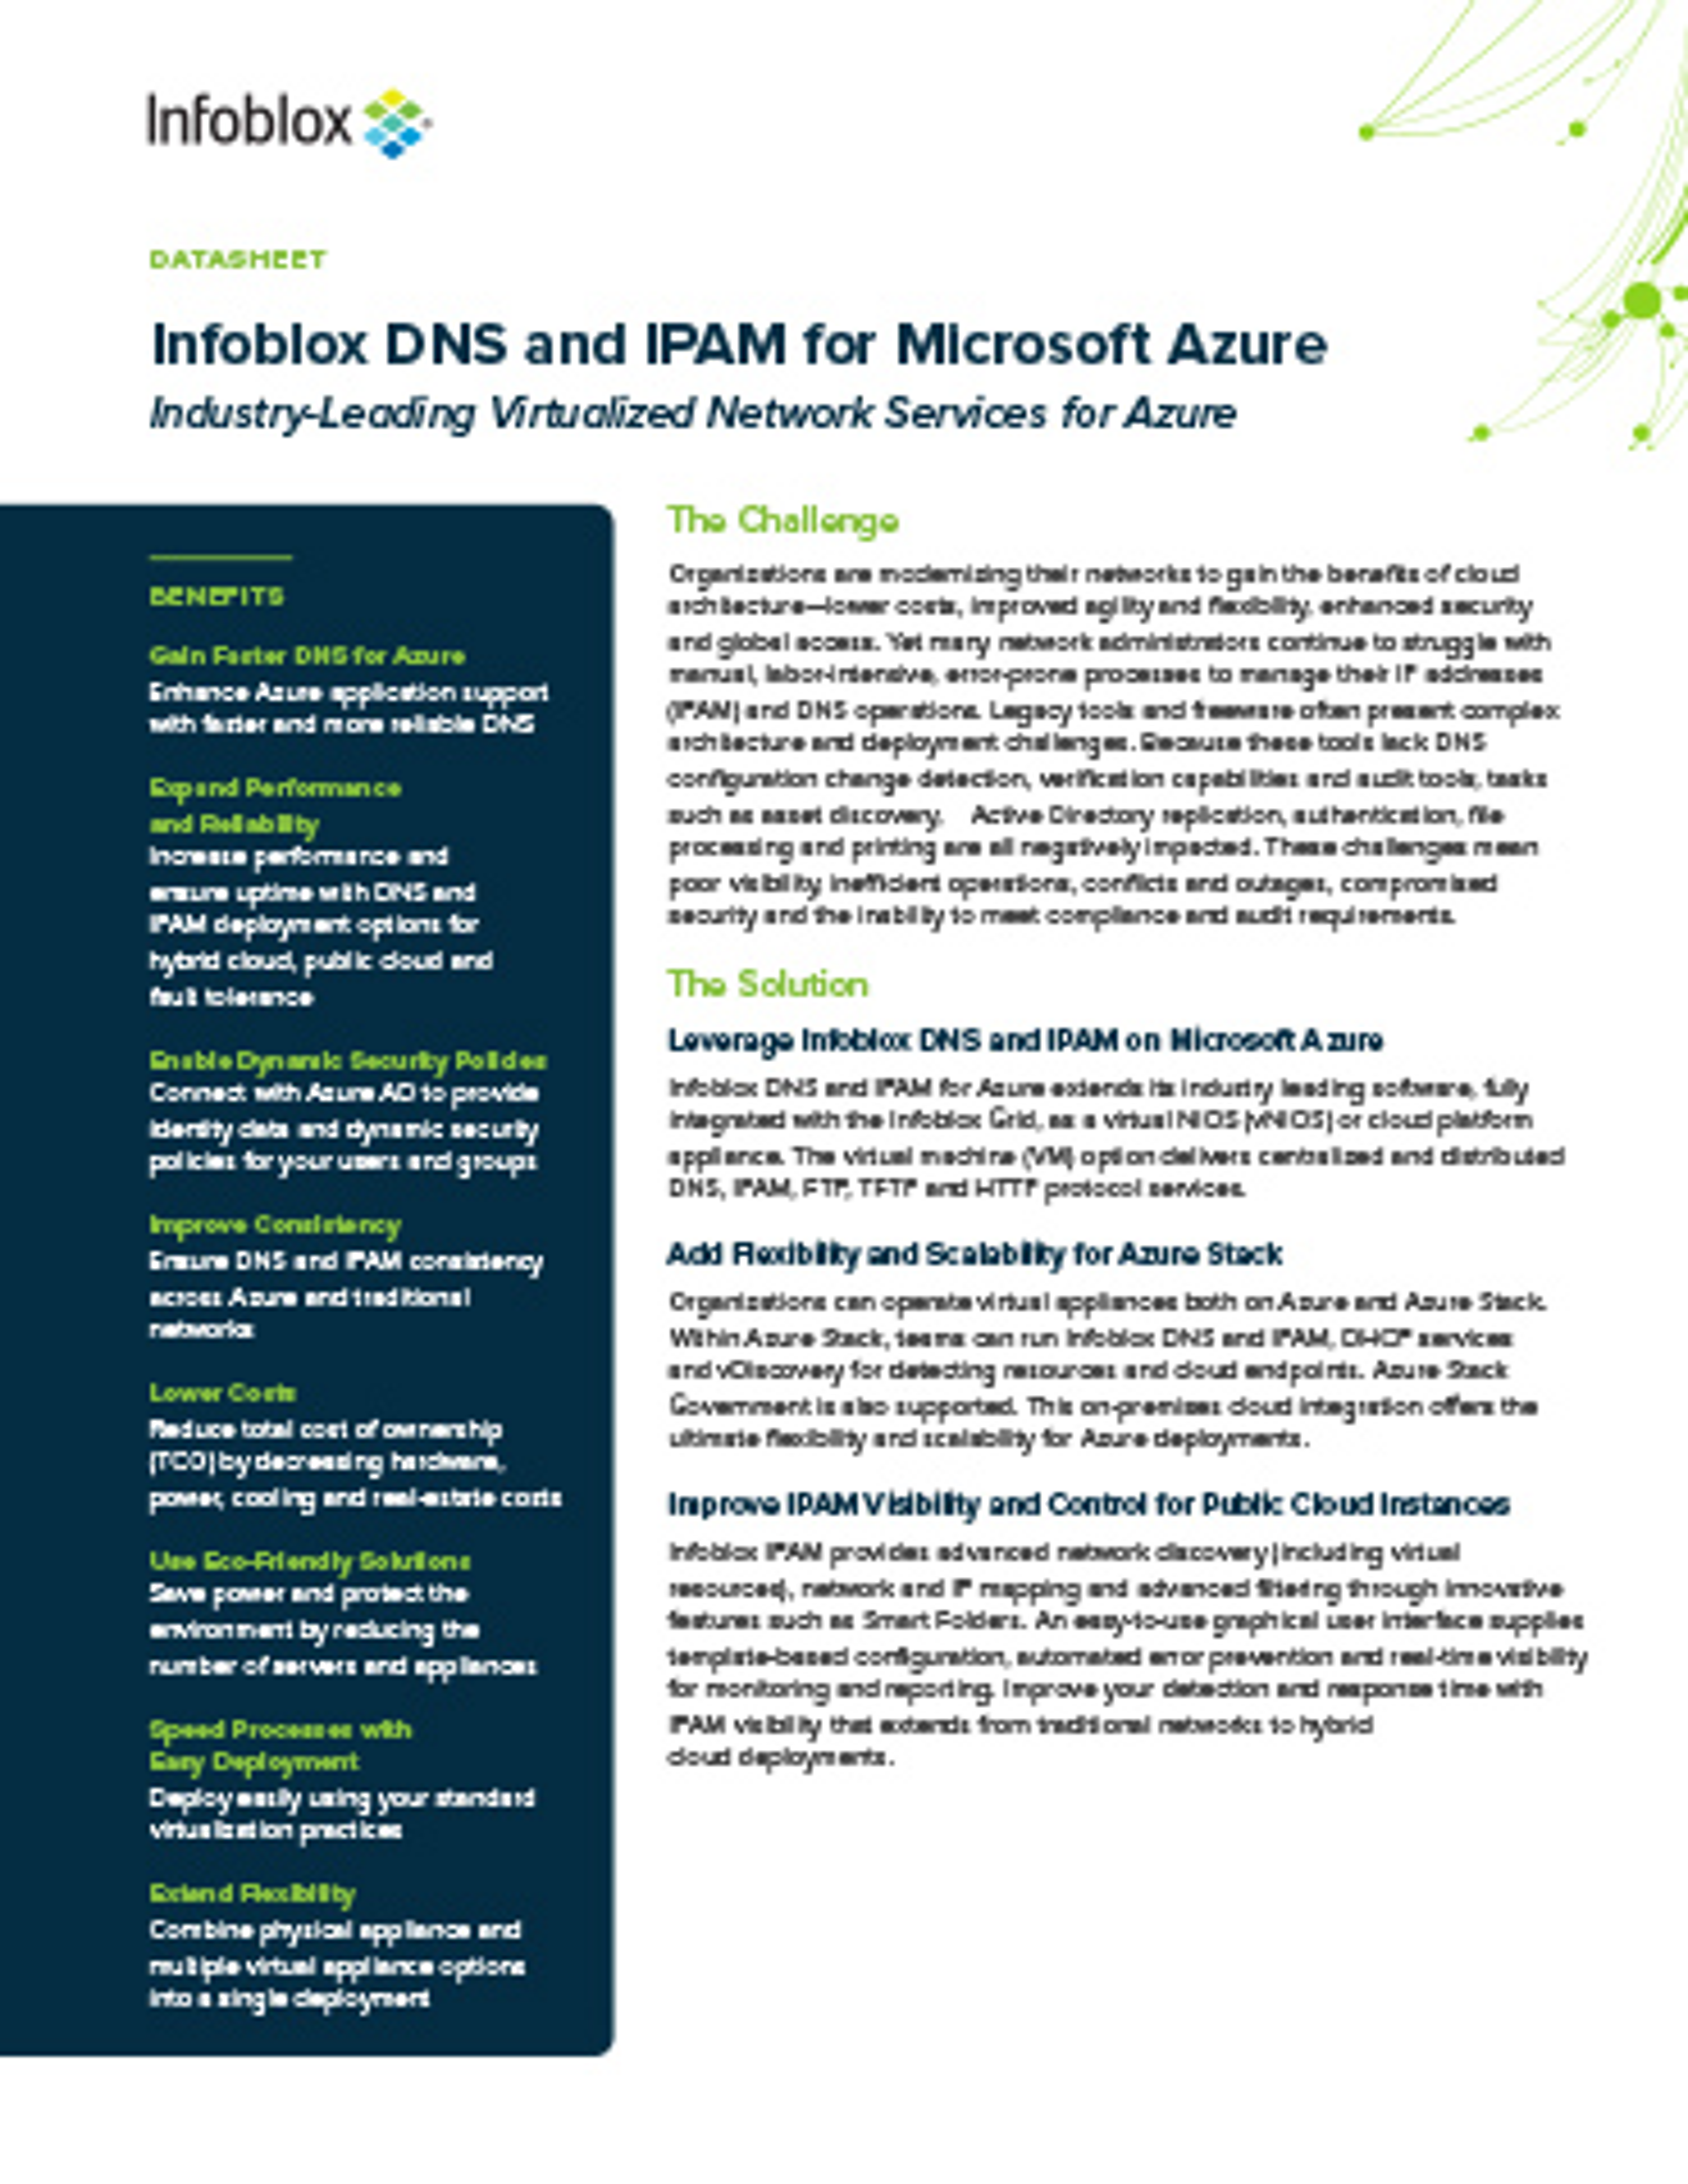 Infoblox Virtual Appliance Software For Microsoft Azure